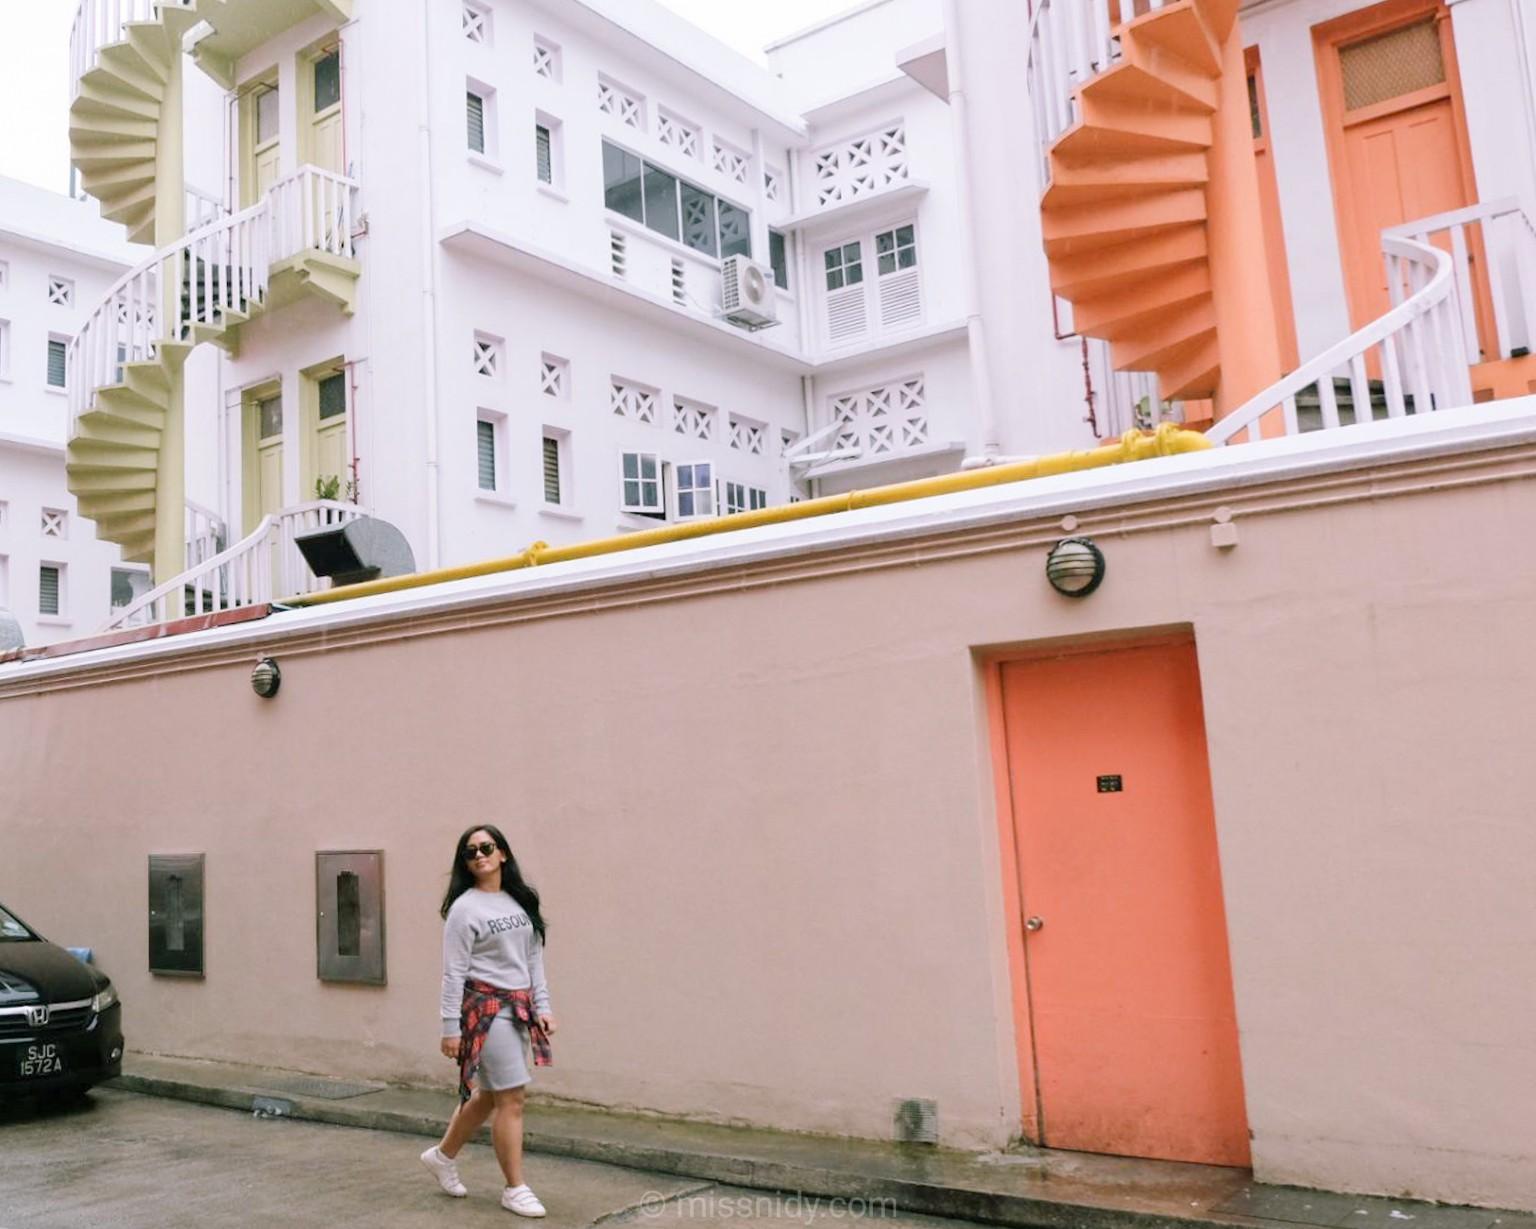 travelling ke singapura setelah pandemi covid-19 berakhir